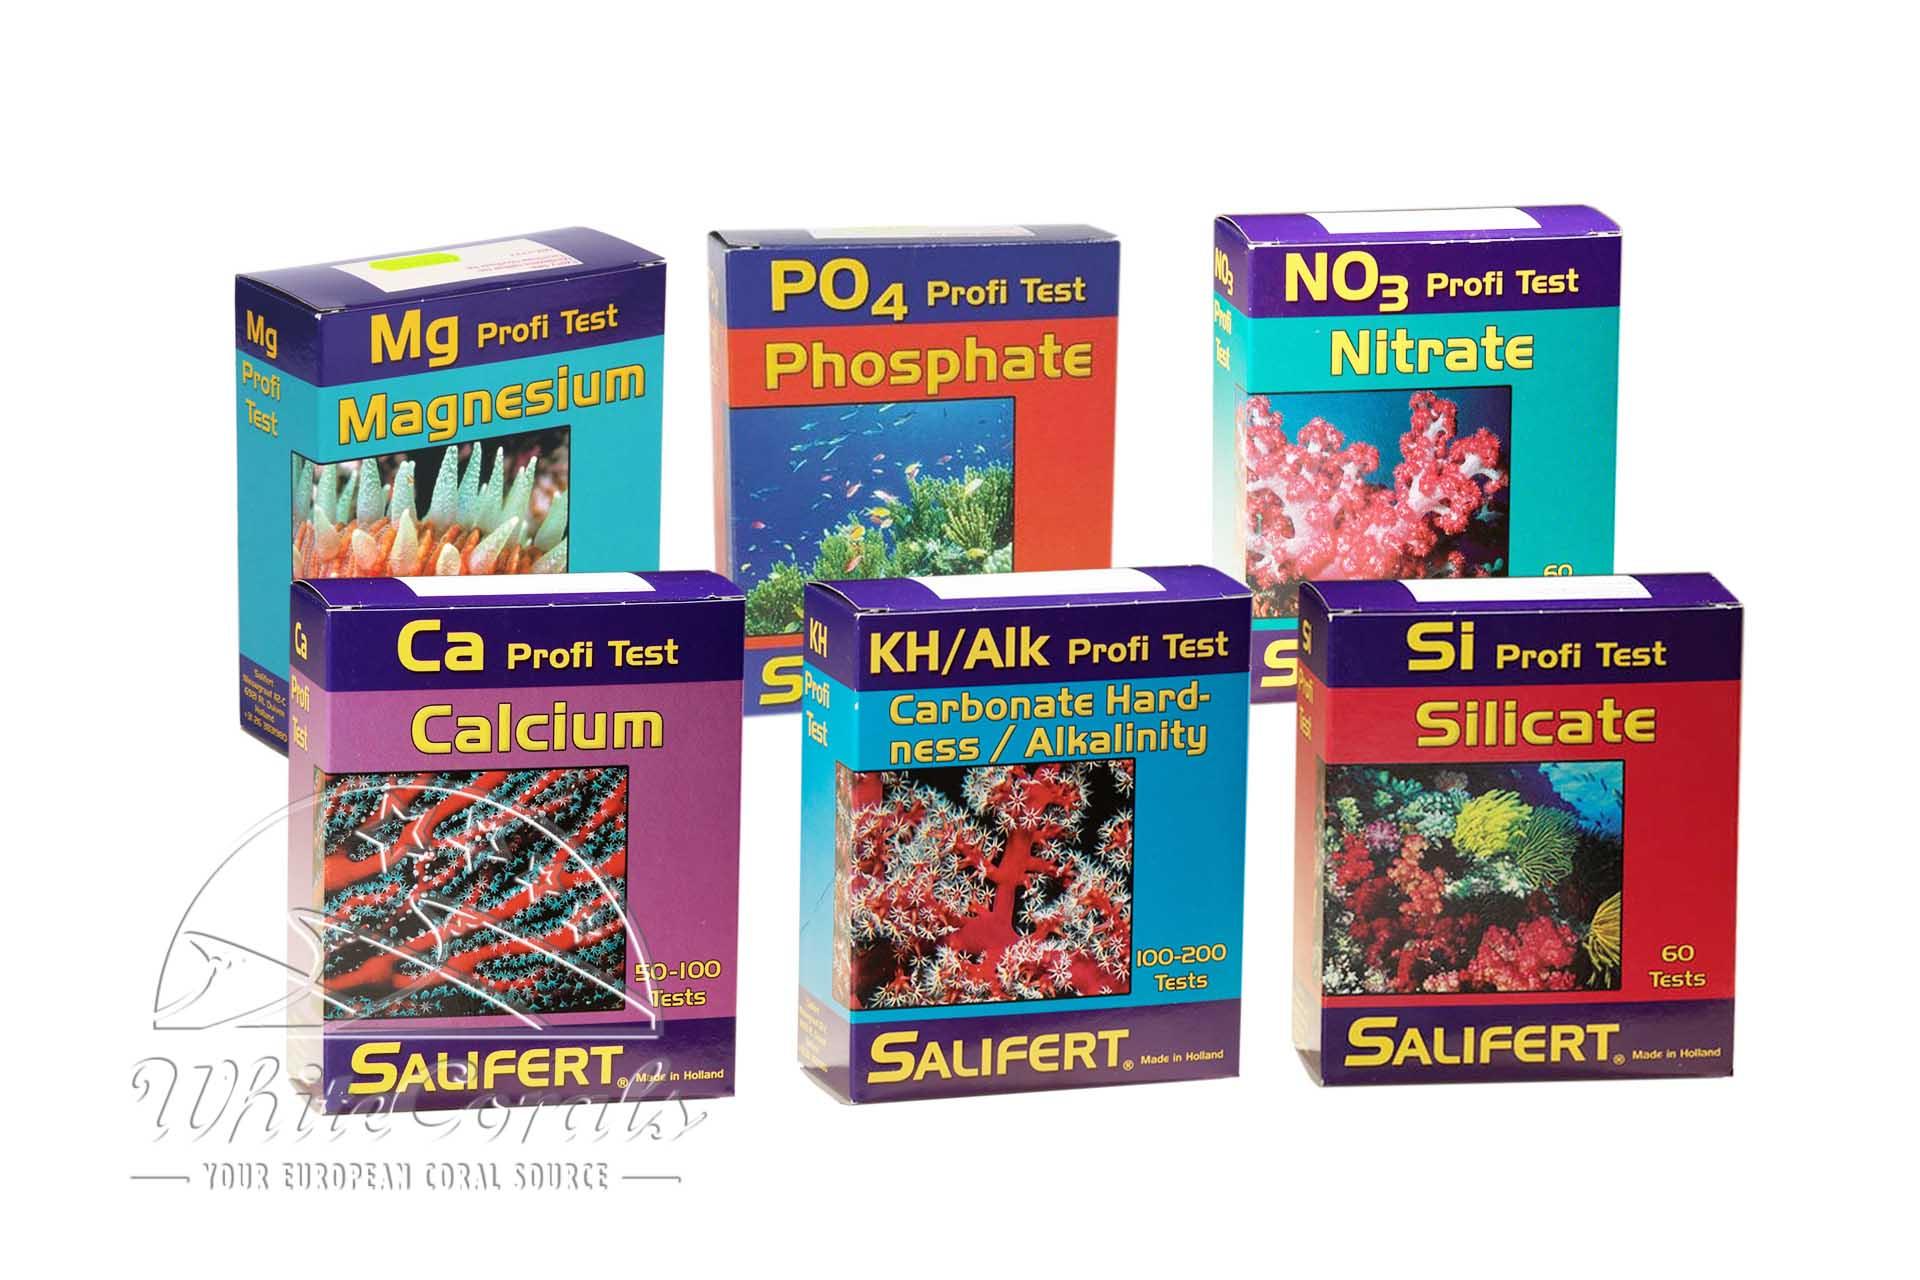 Salifert Mg,Ca,PO4,NO3,KH Alk,Si Test Kit Wassertest